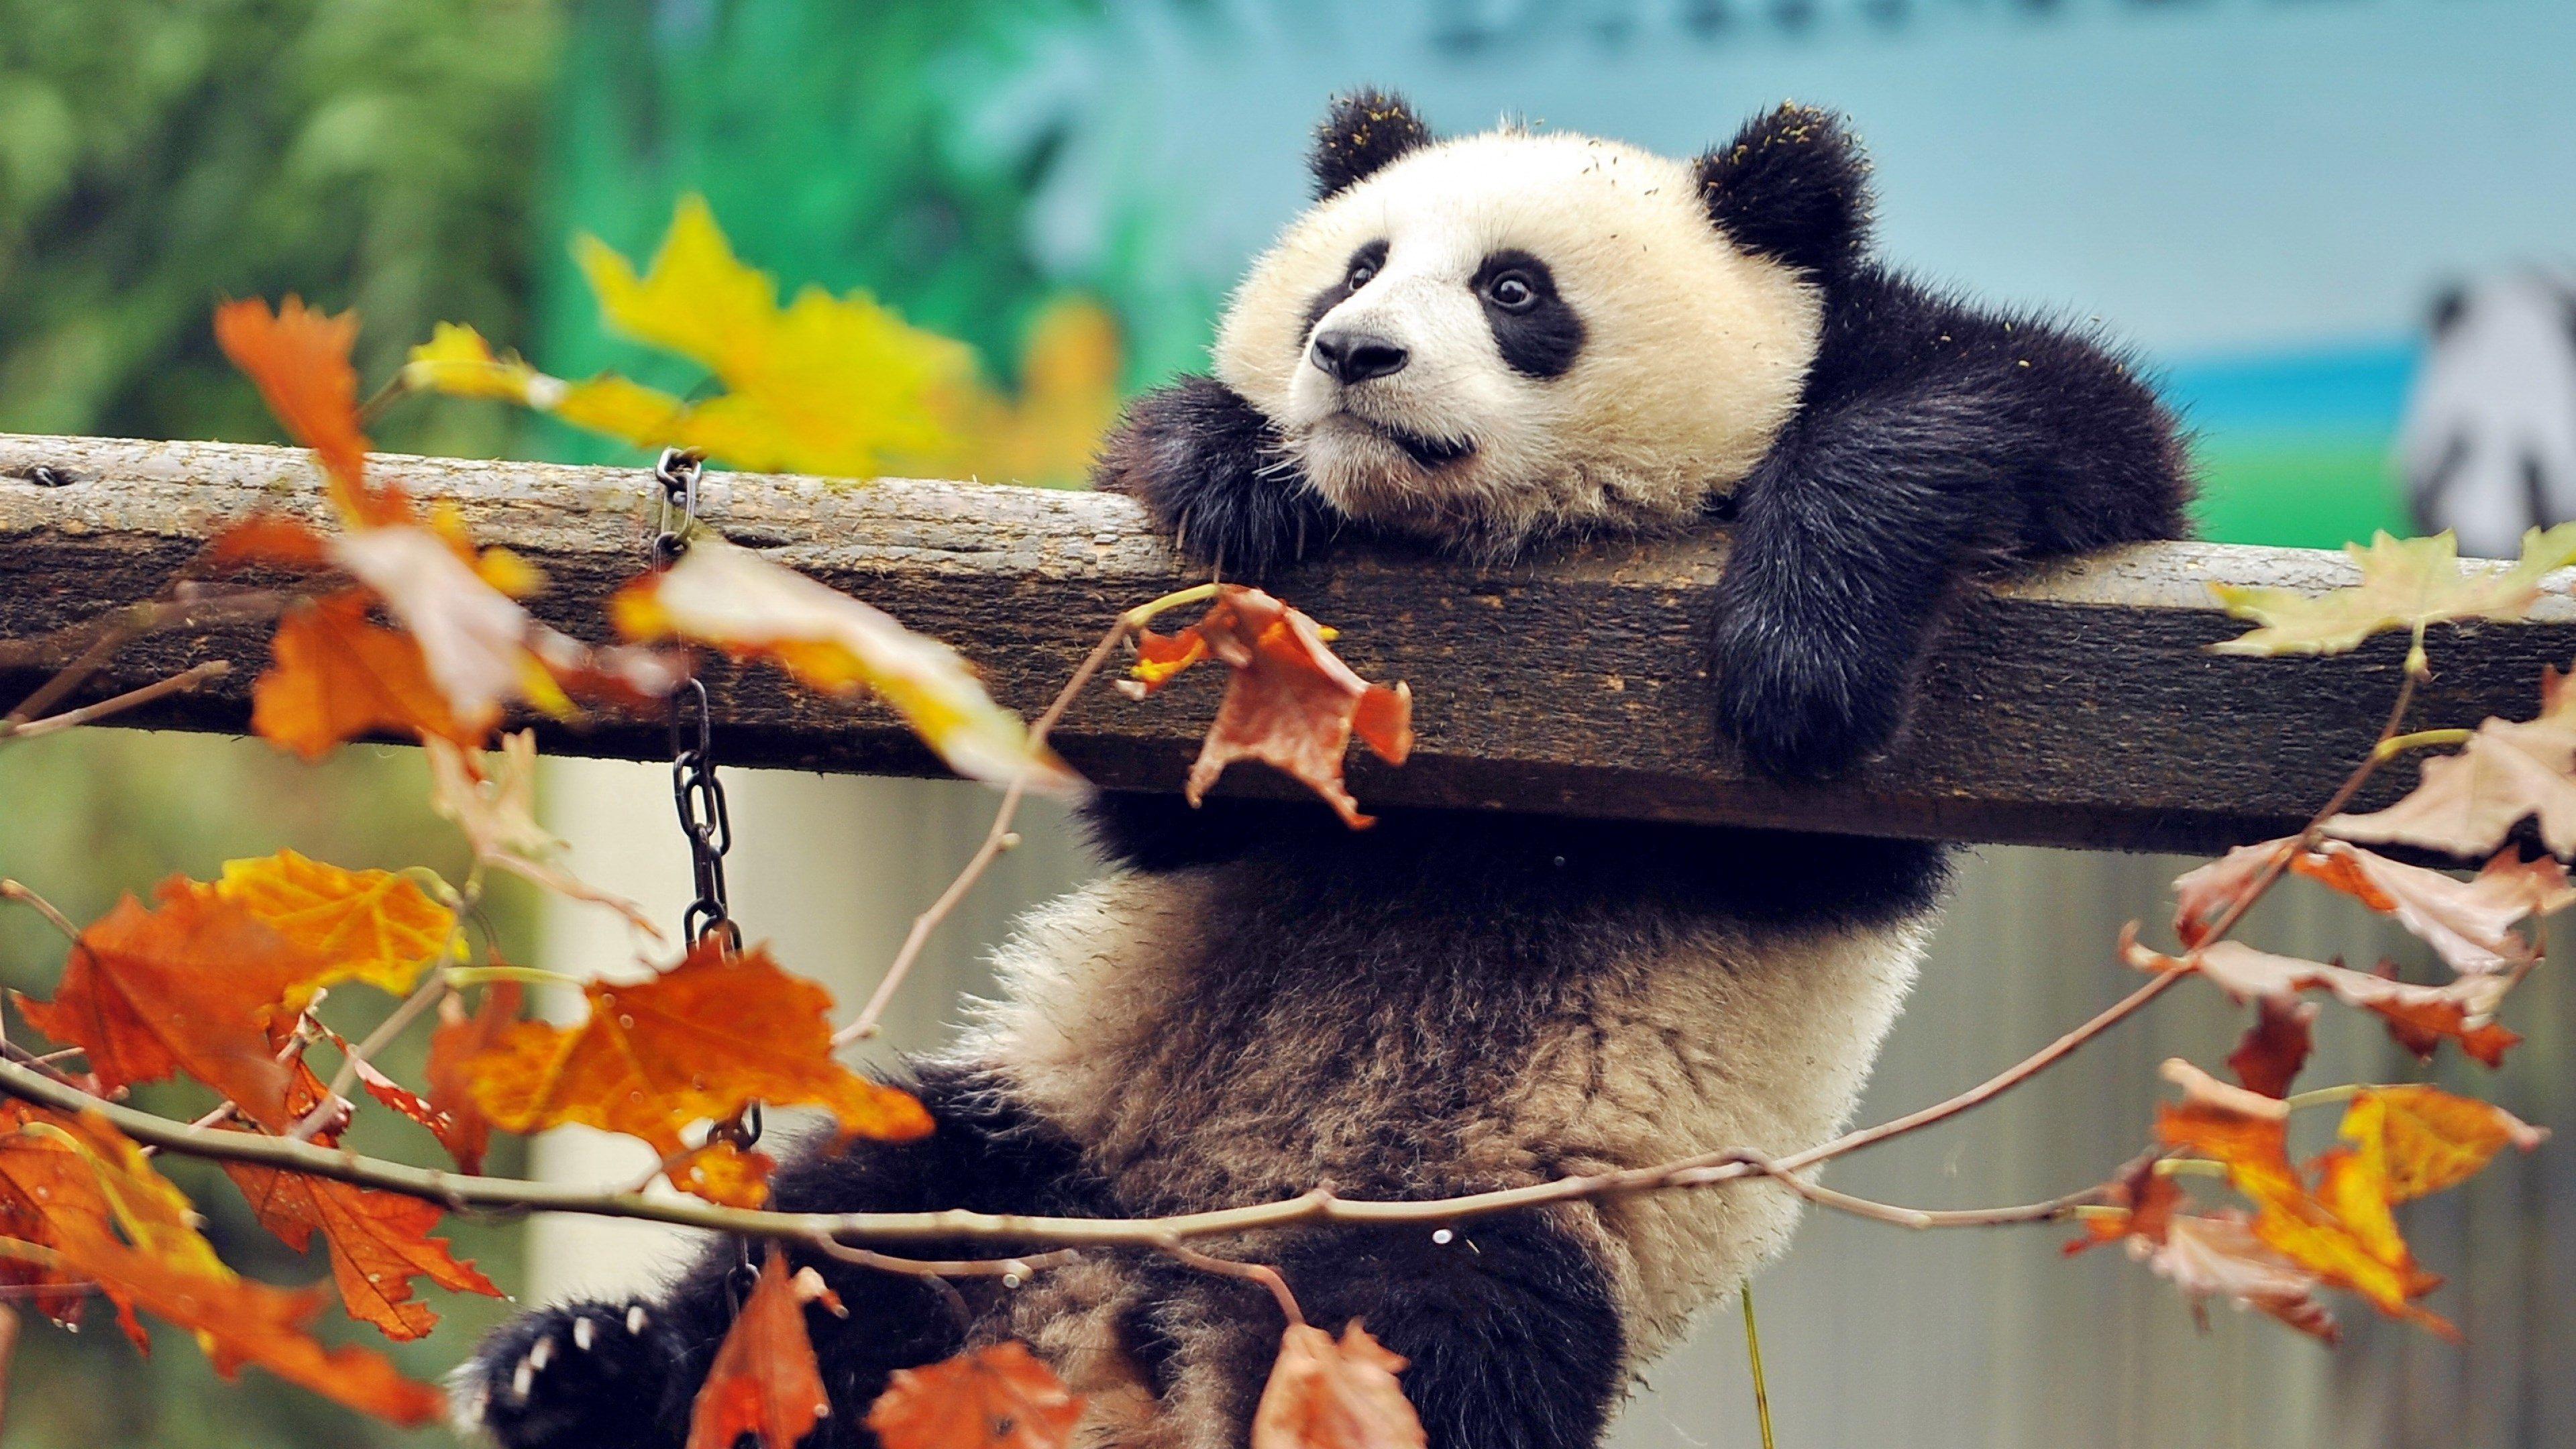 3840x2160 Panda 4k Best High Resolution Wallpaper Panda Bear Cute Animals Panda Wallpapers